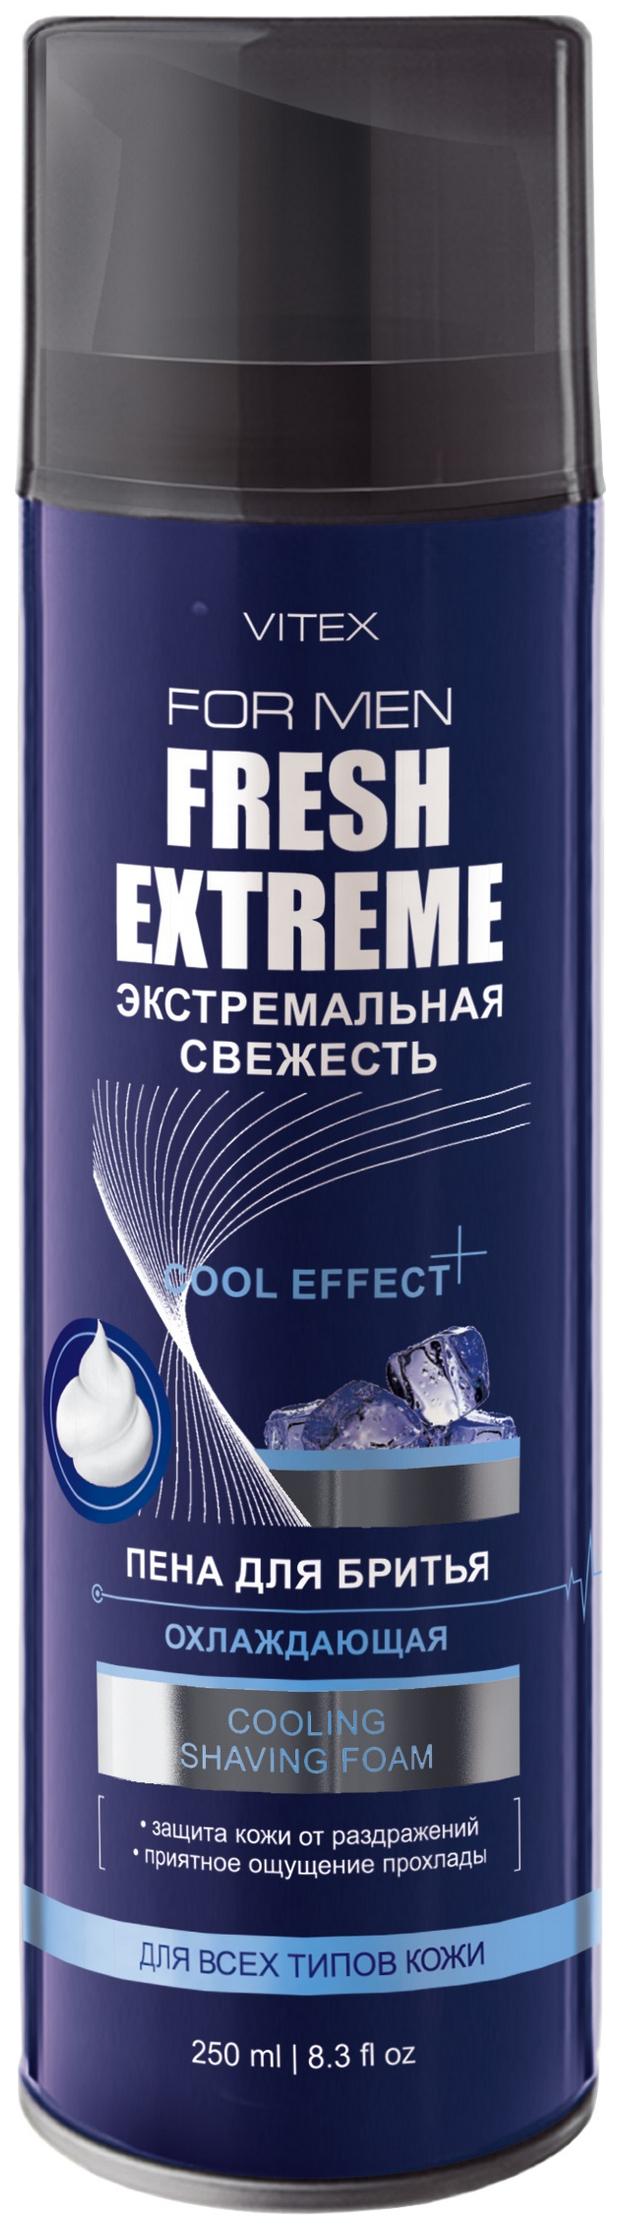 Пена для бритья Витэкс Vitex For Men Fresh Extreme Охлаждающая 250 мл